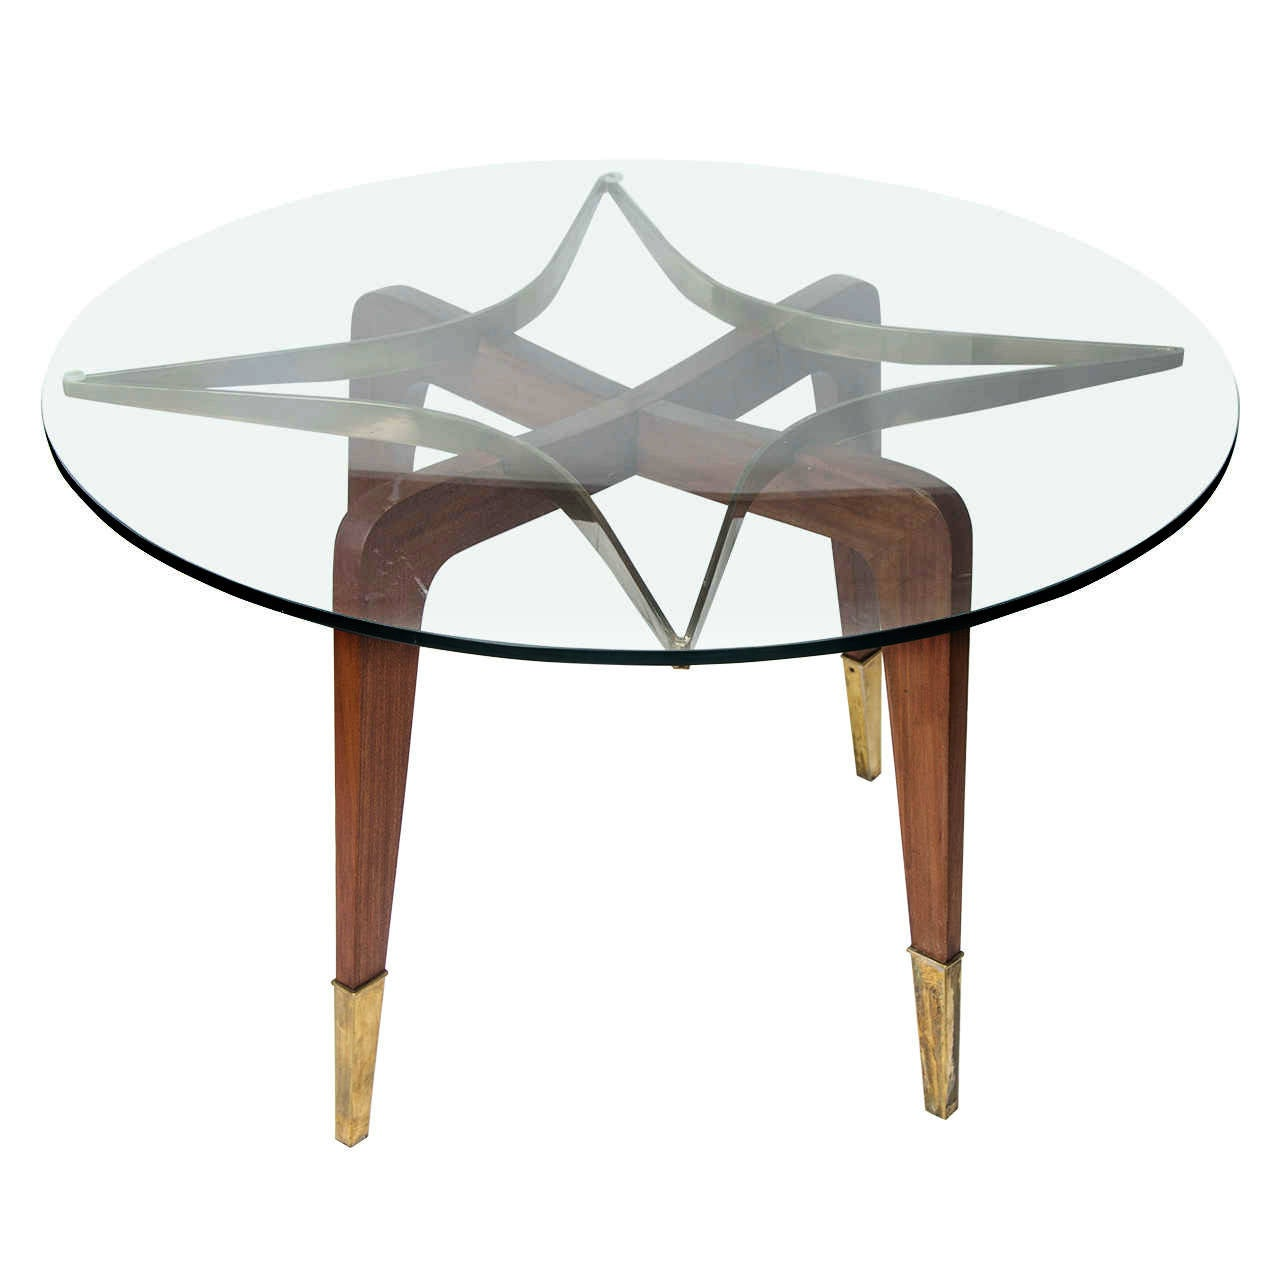 1950s Italian Coffee Table by Paolo Buffa at 1stdibs